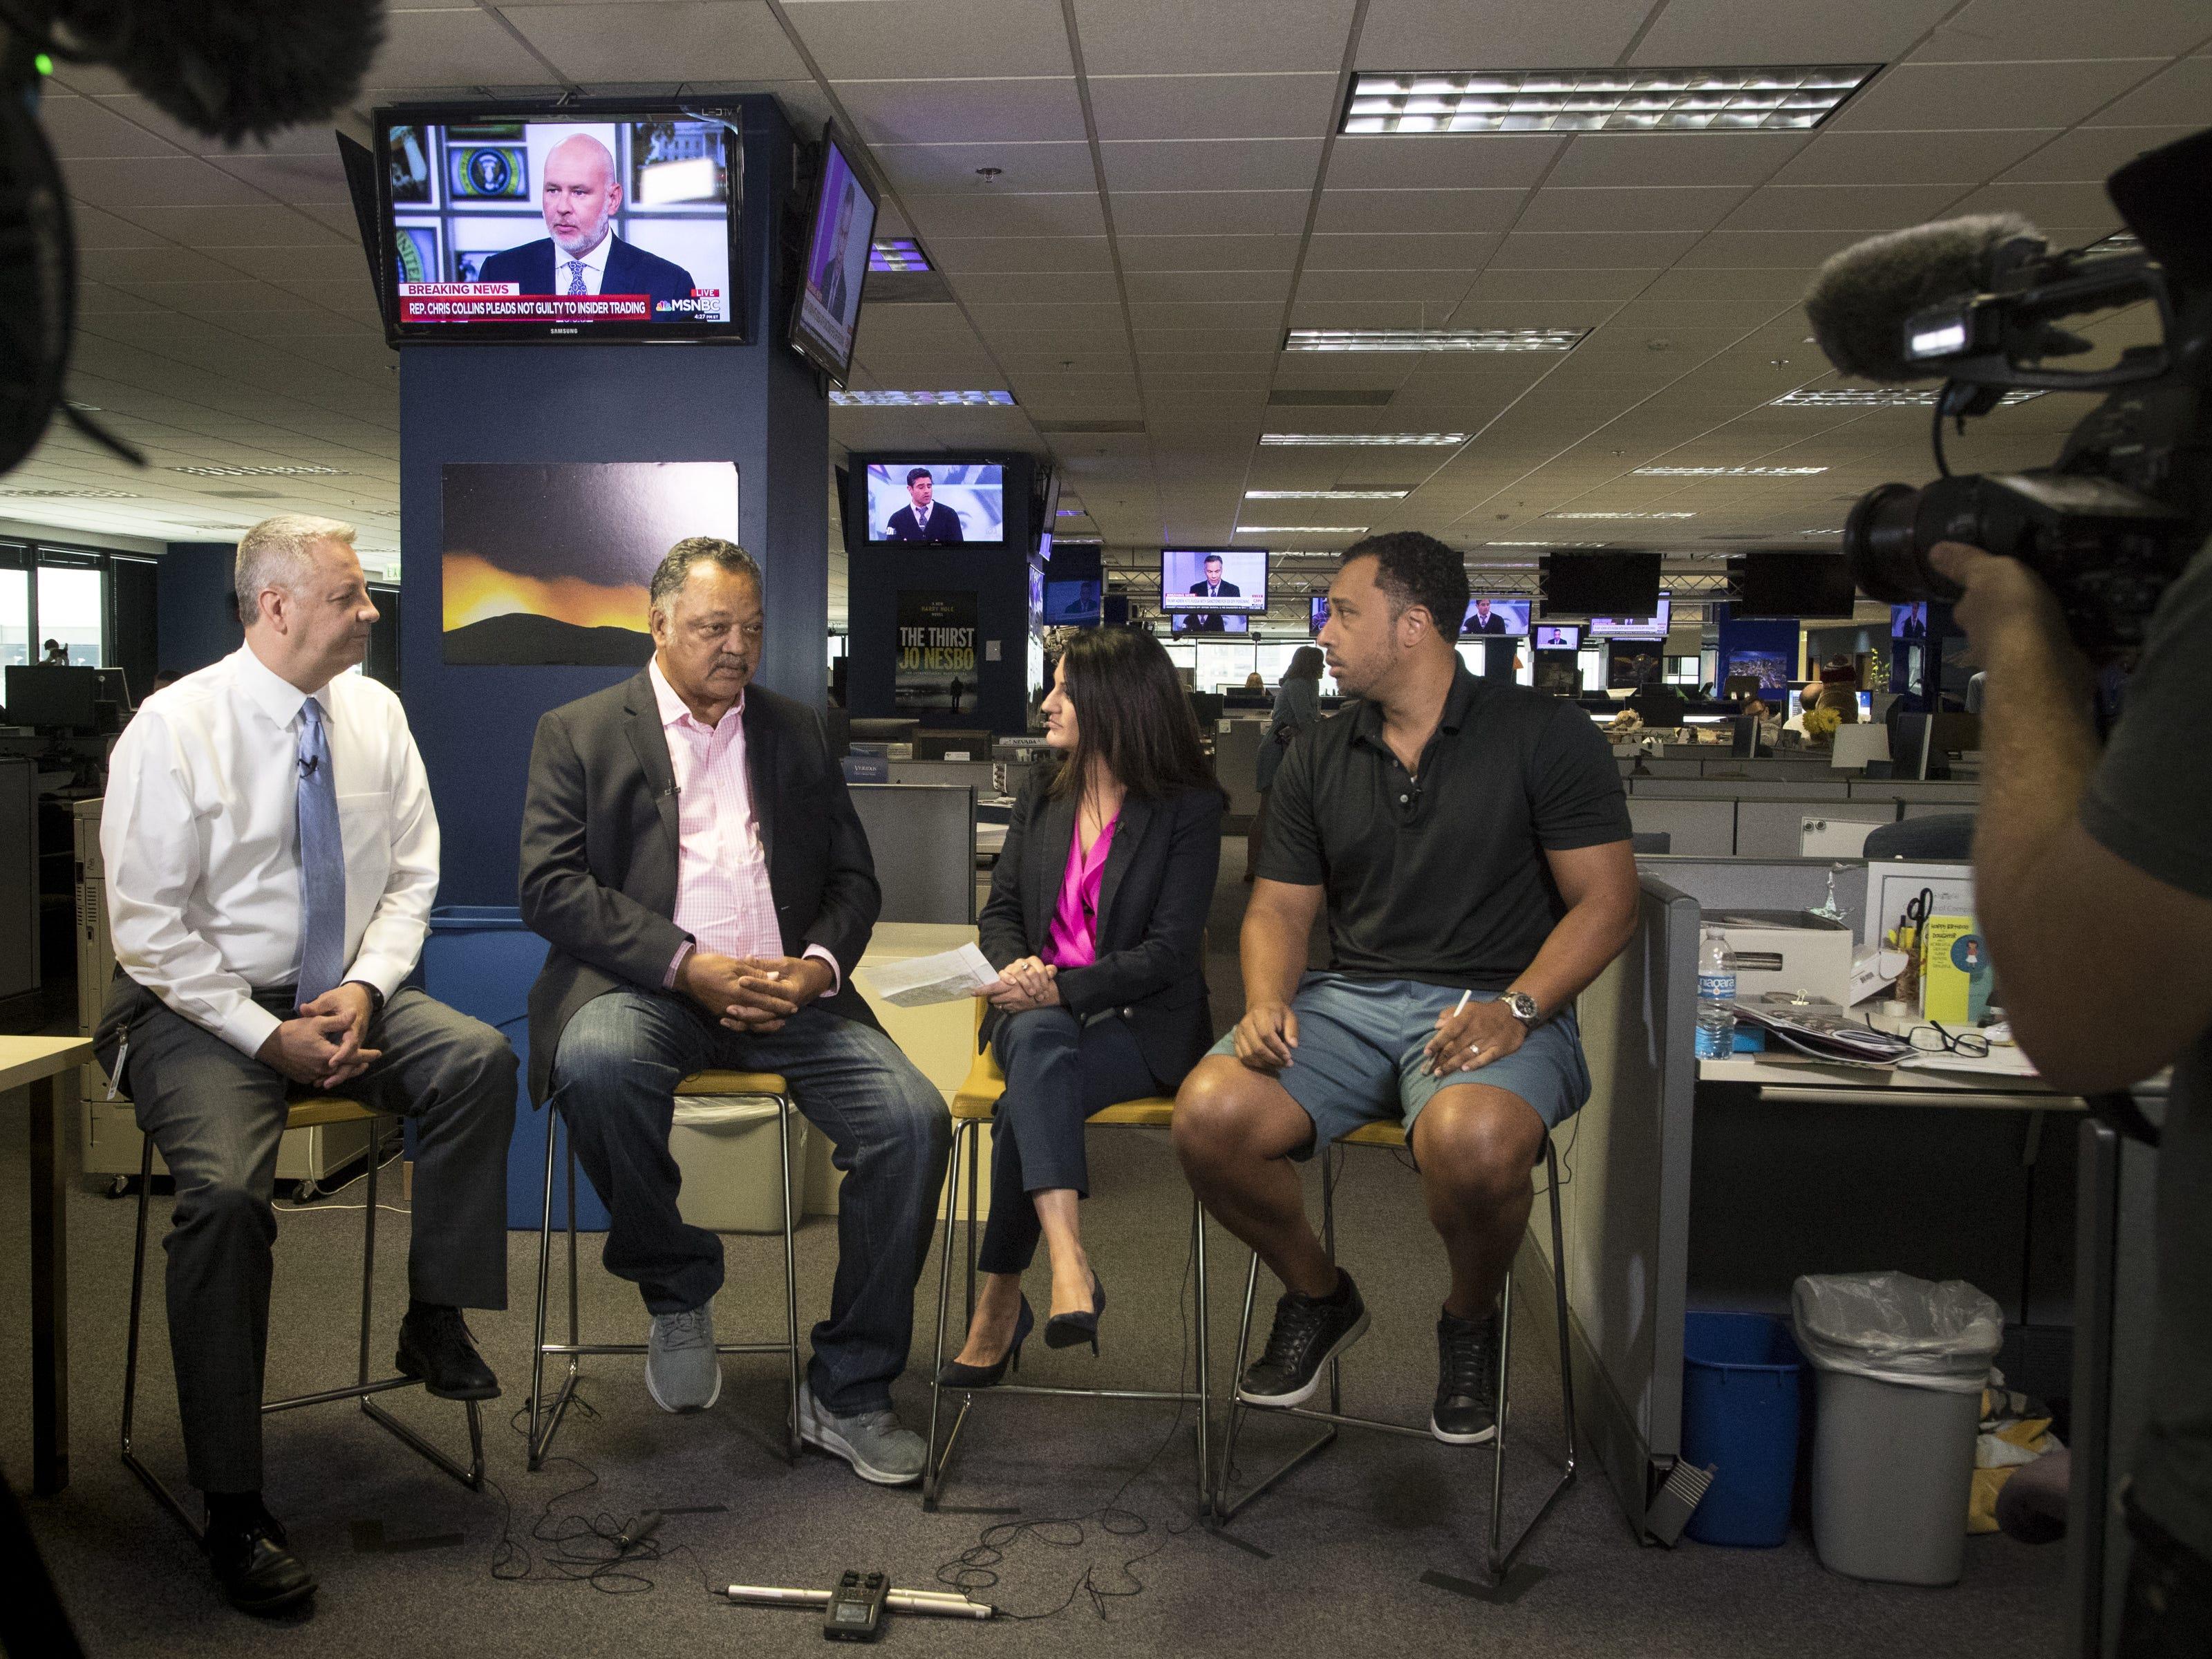 Ron Hansen, Yvonne Wingett Sanchez and Greg Moore interview Jesse Jackson at The Arizona Republic on Aug. 8, 2018.